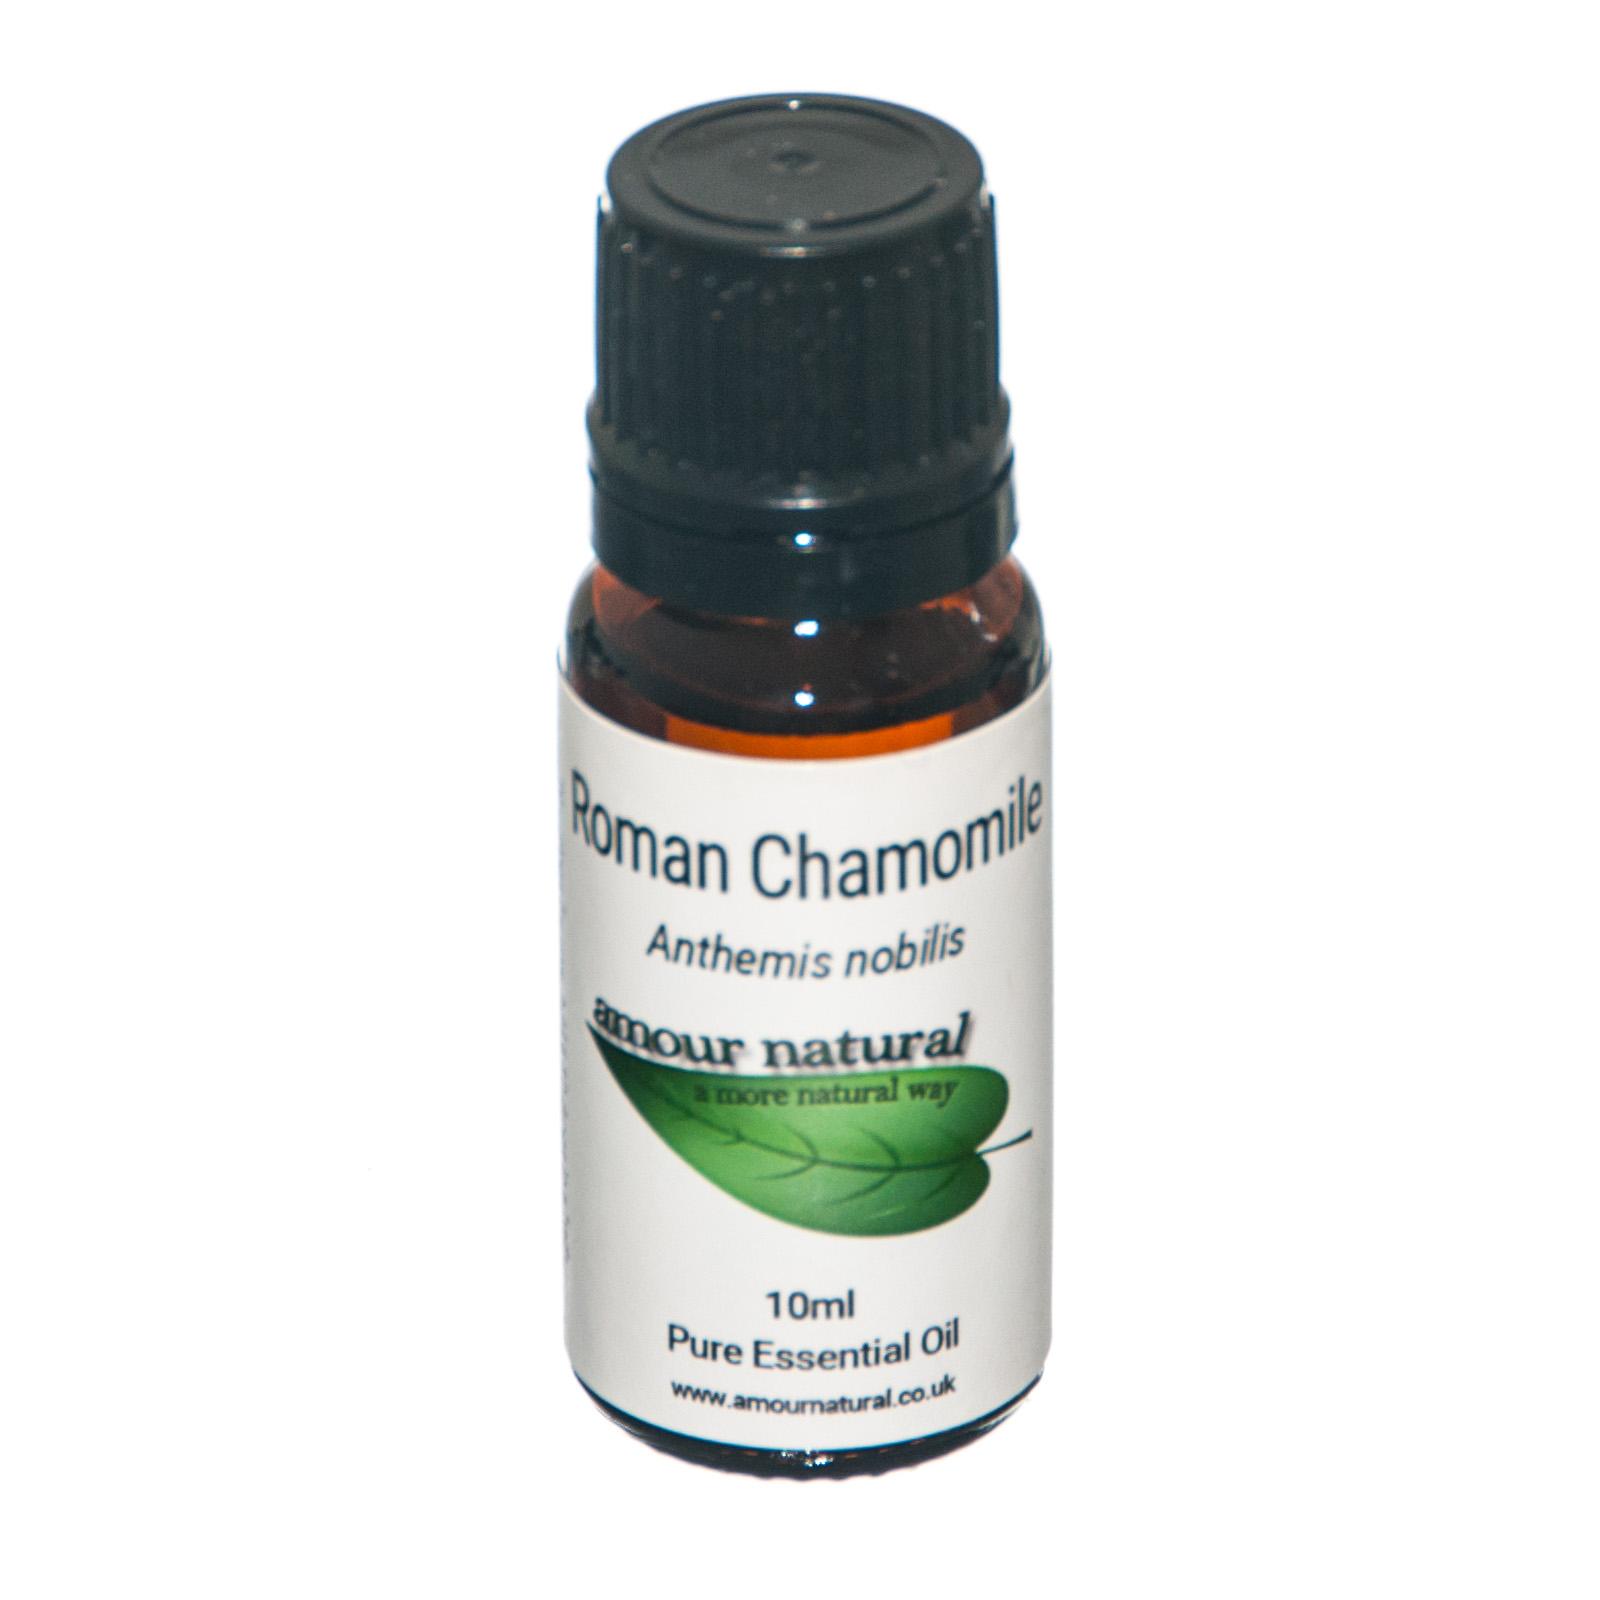 Roman Chamomile 10ml